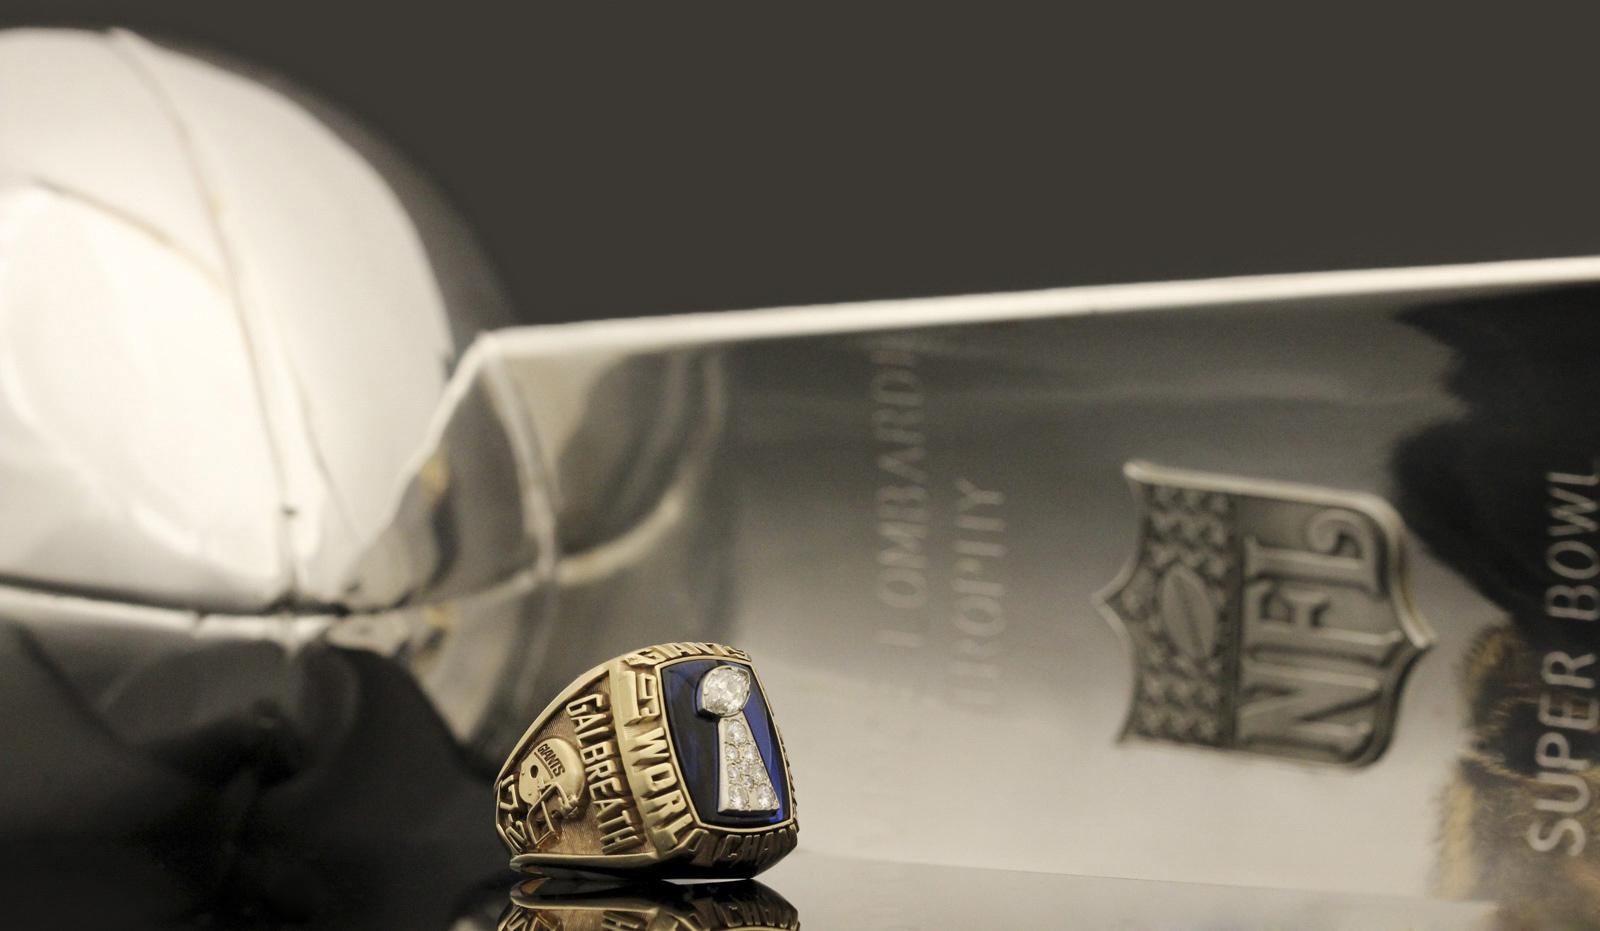 Tony Galbreath Super Bowl ring-trophy